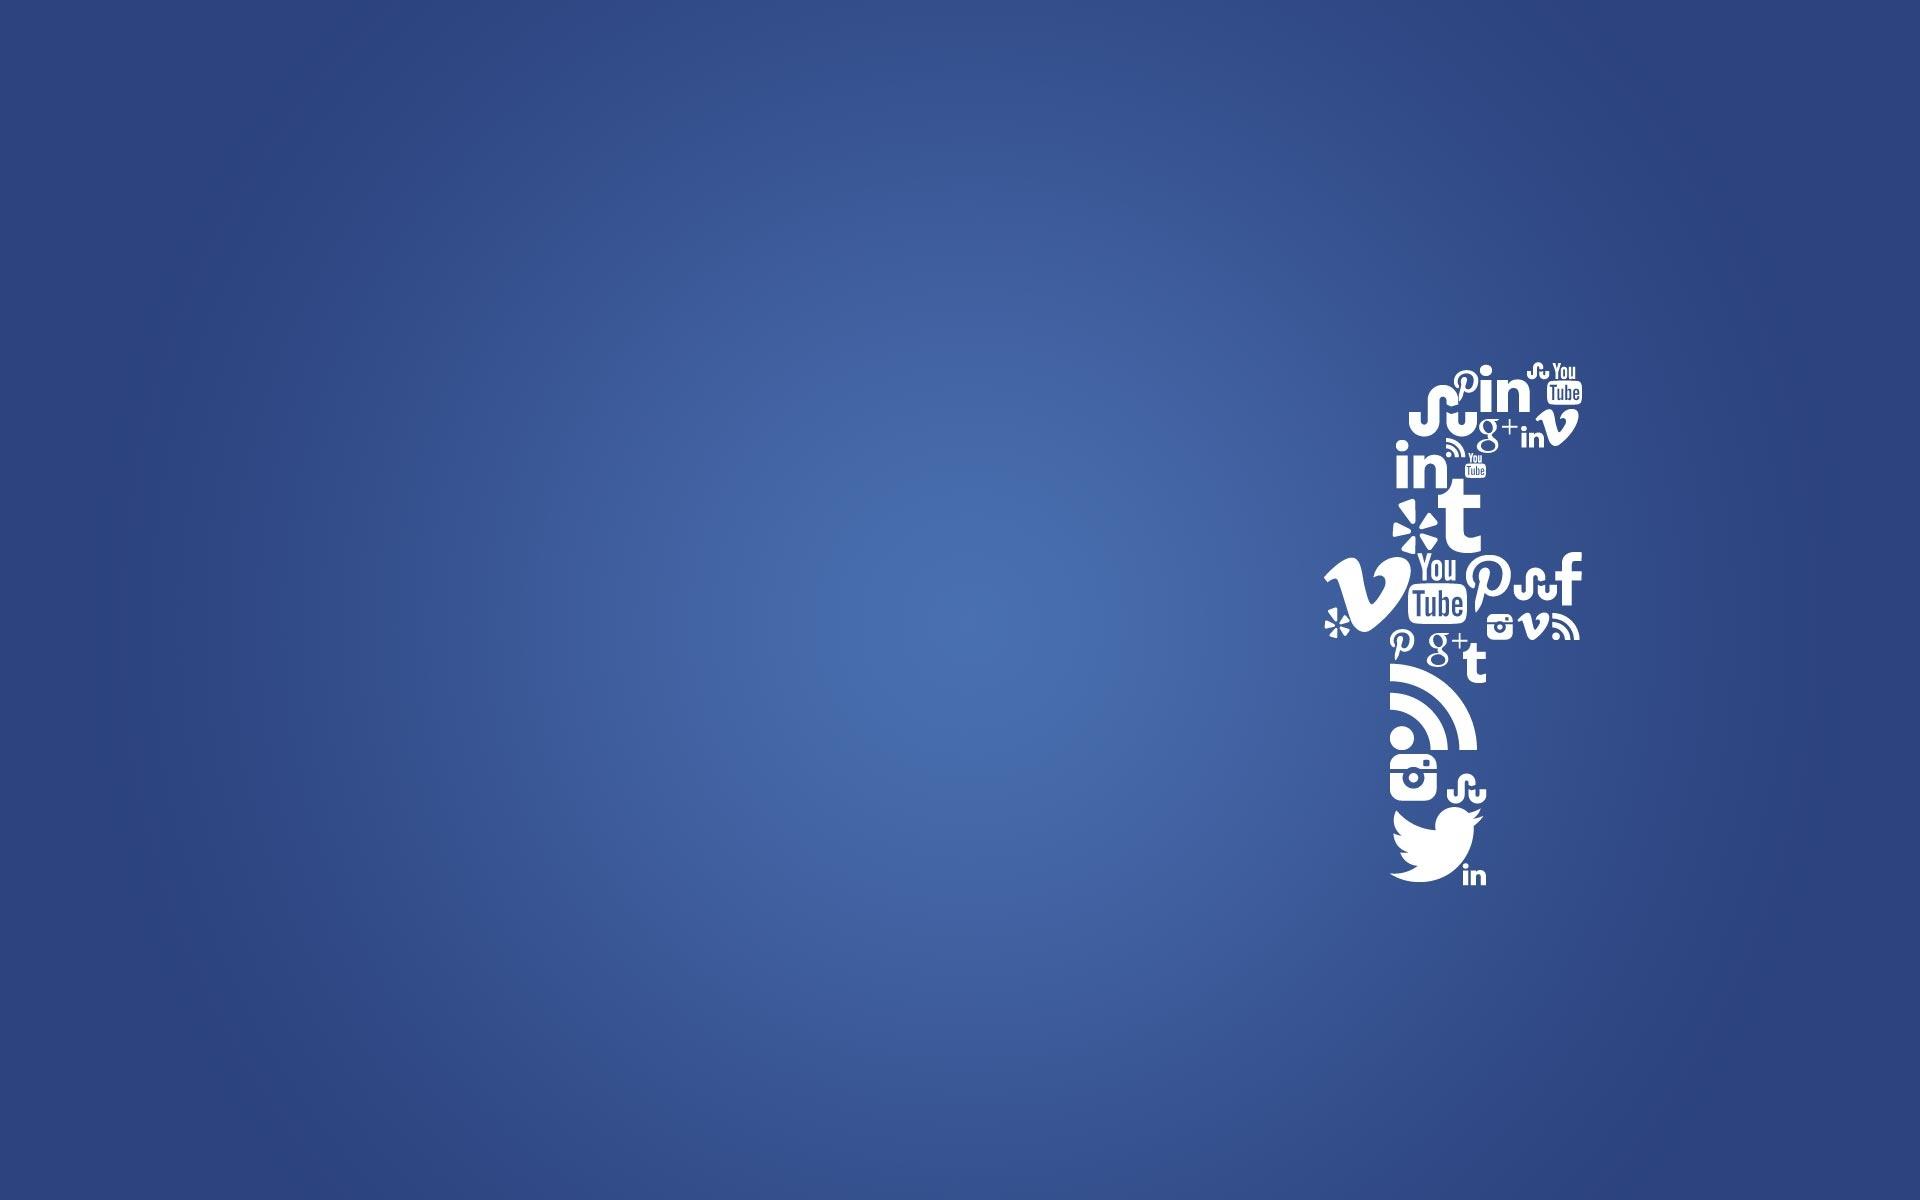 _downloadfiles_wallpapers_1920_1200_facebook_logo_16611.jpg